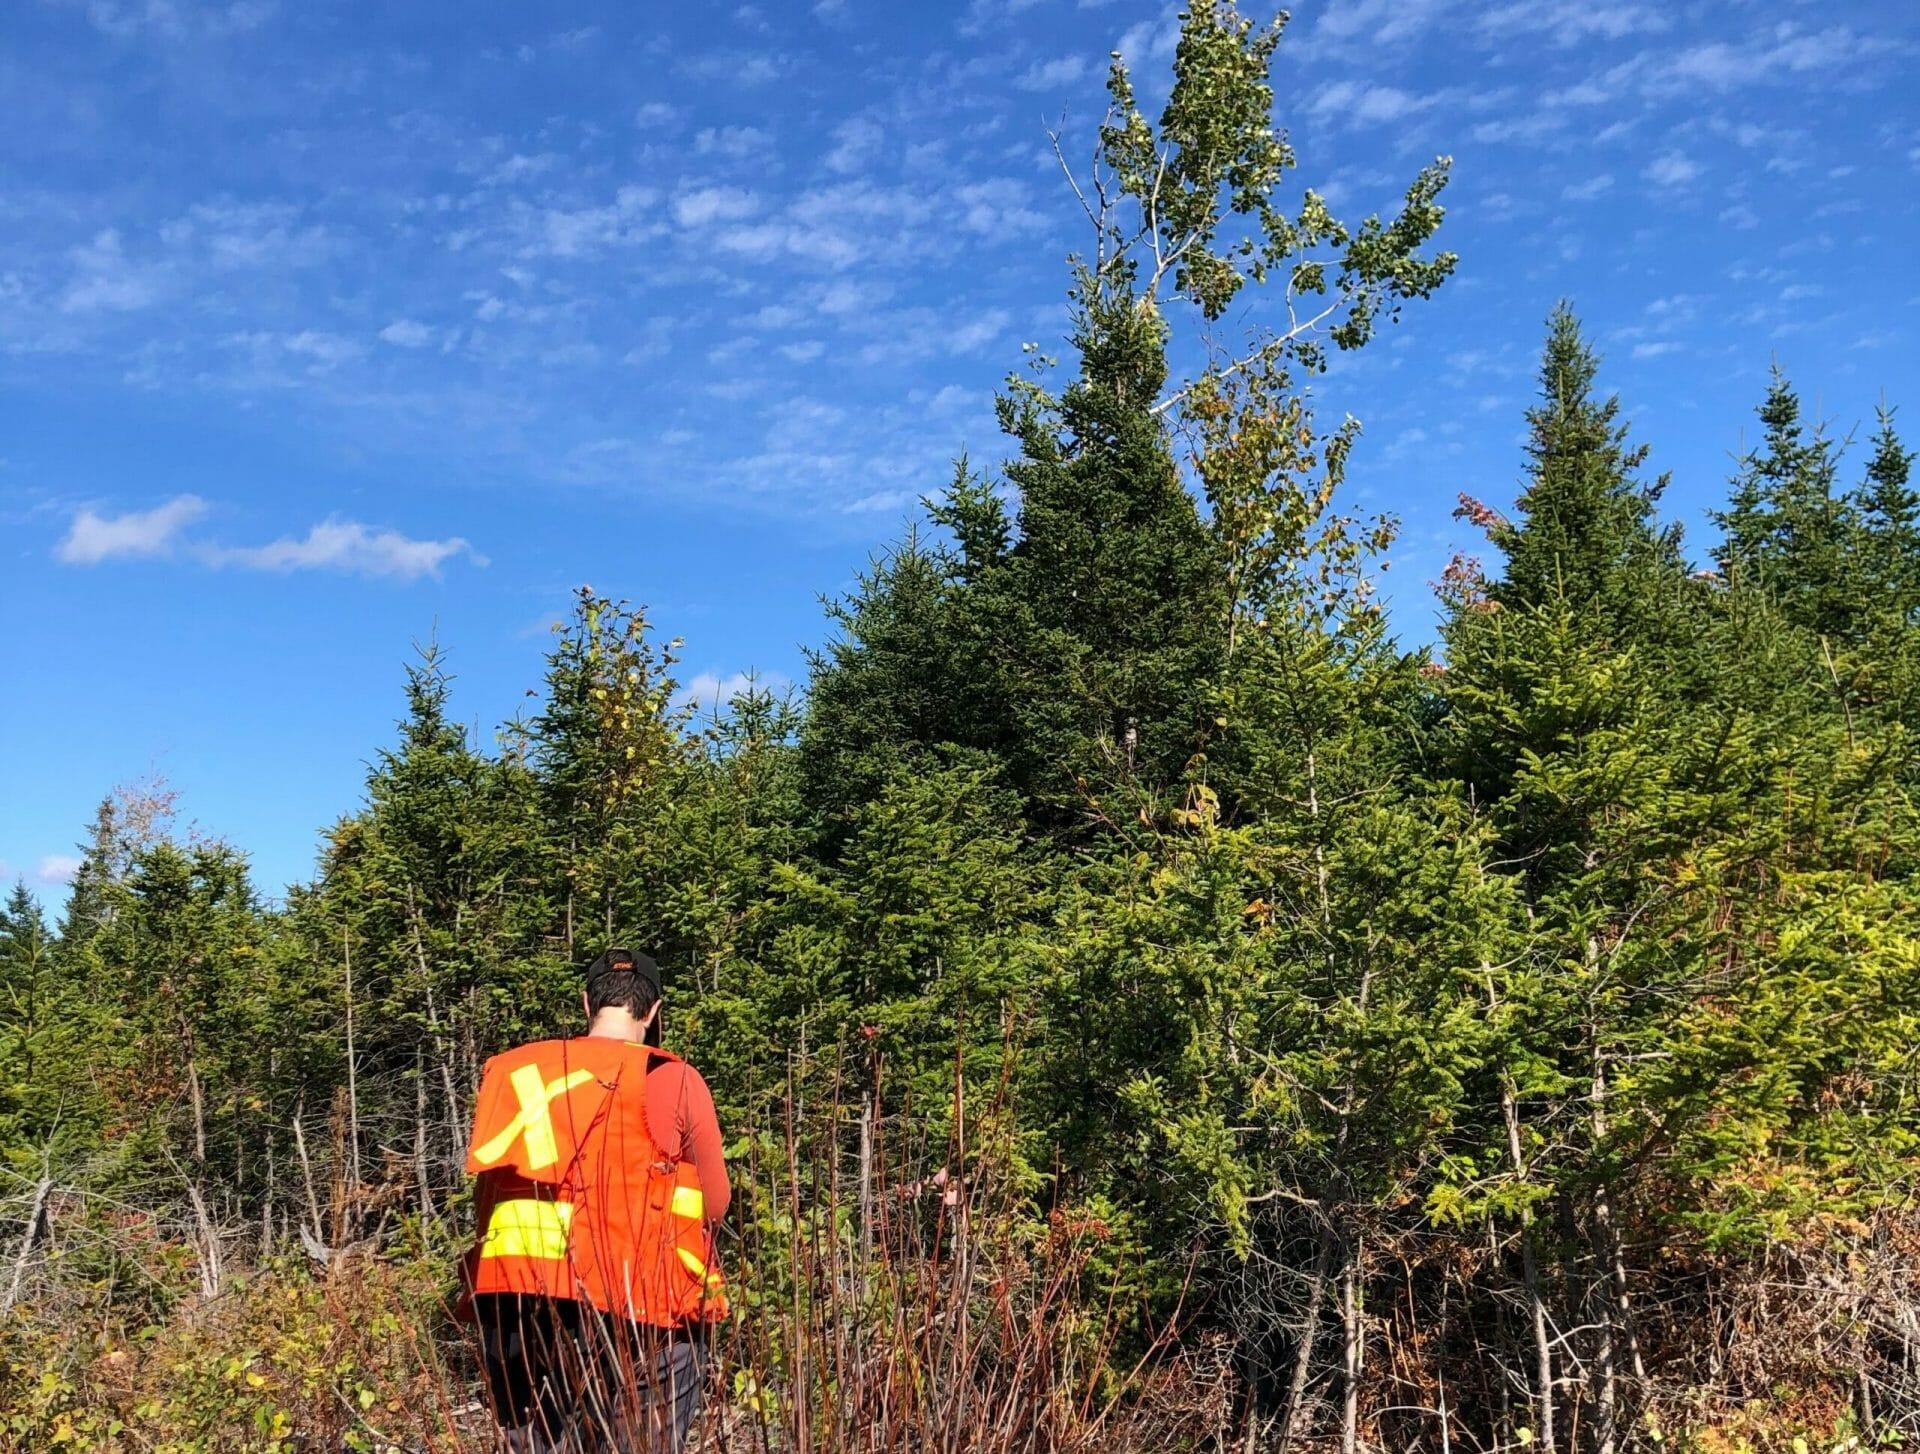 Acadian Forest Manager Megan surveys one of Community Forests' new forests